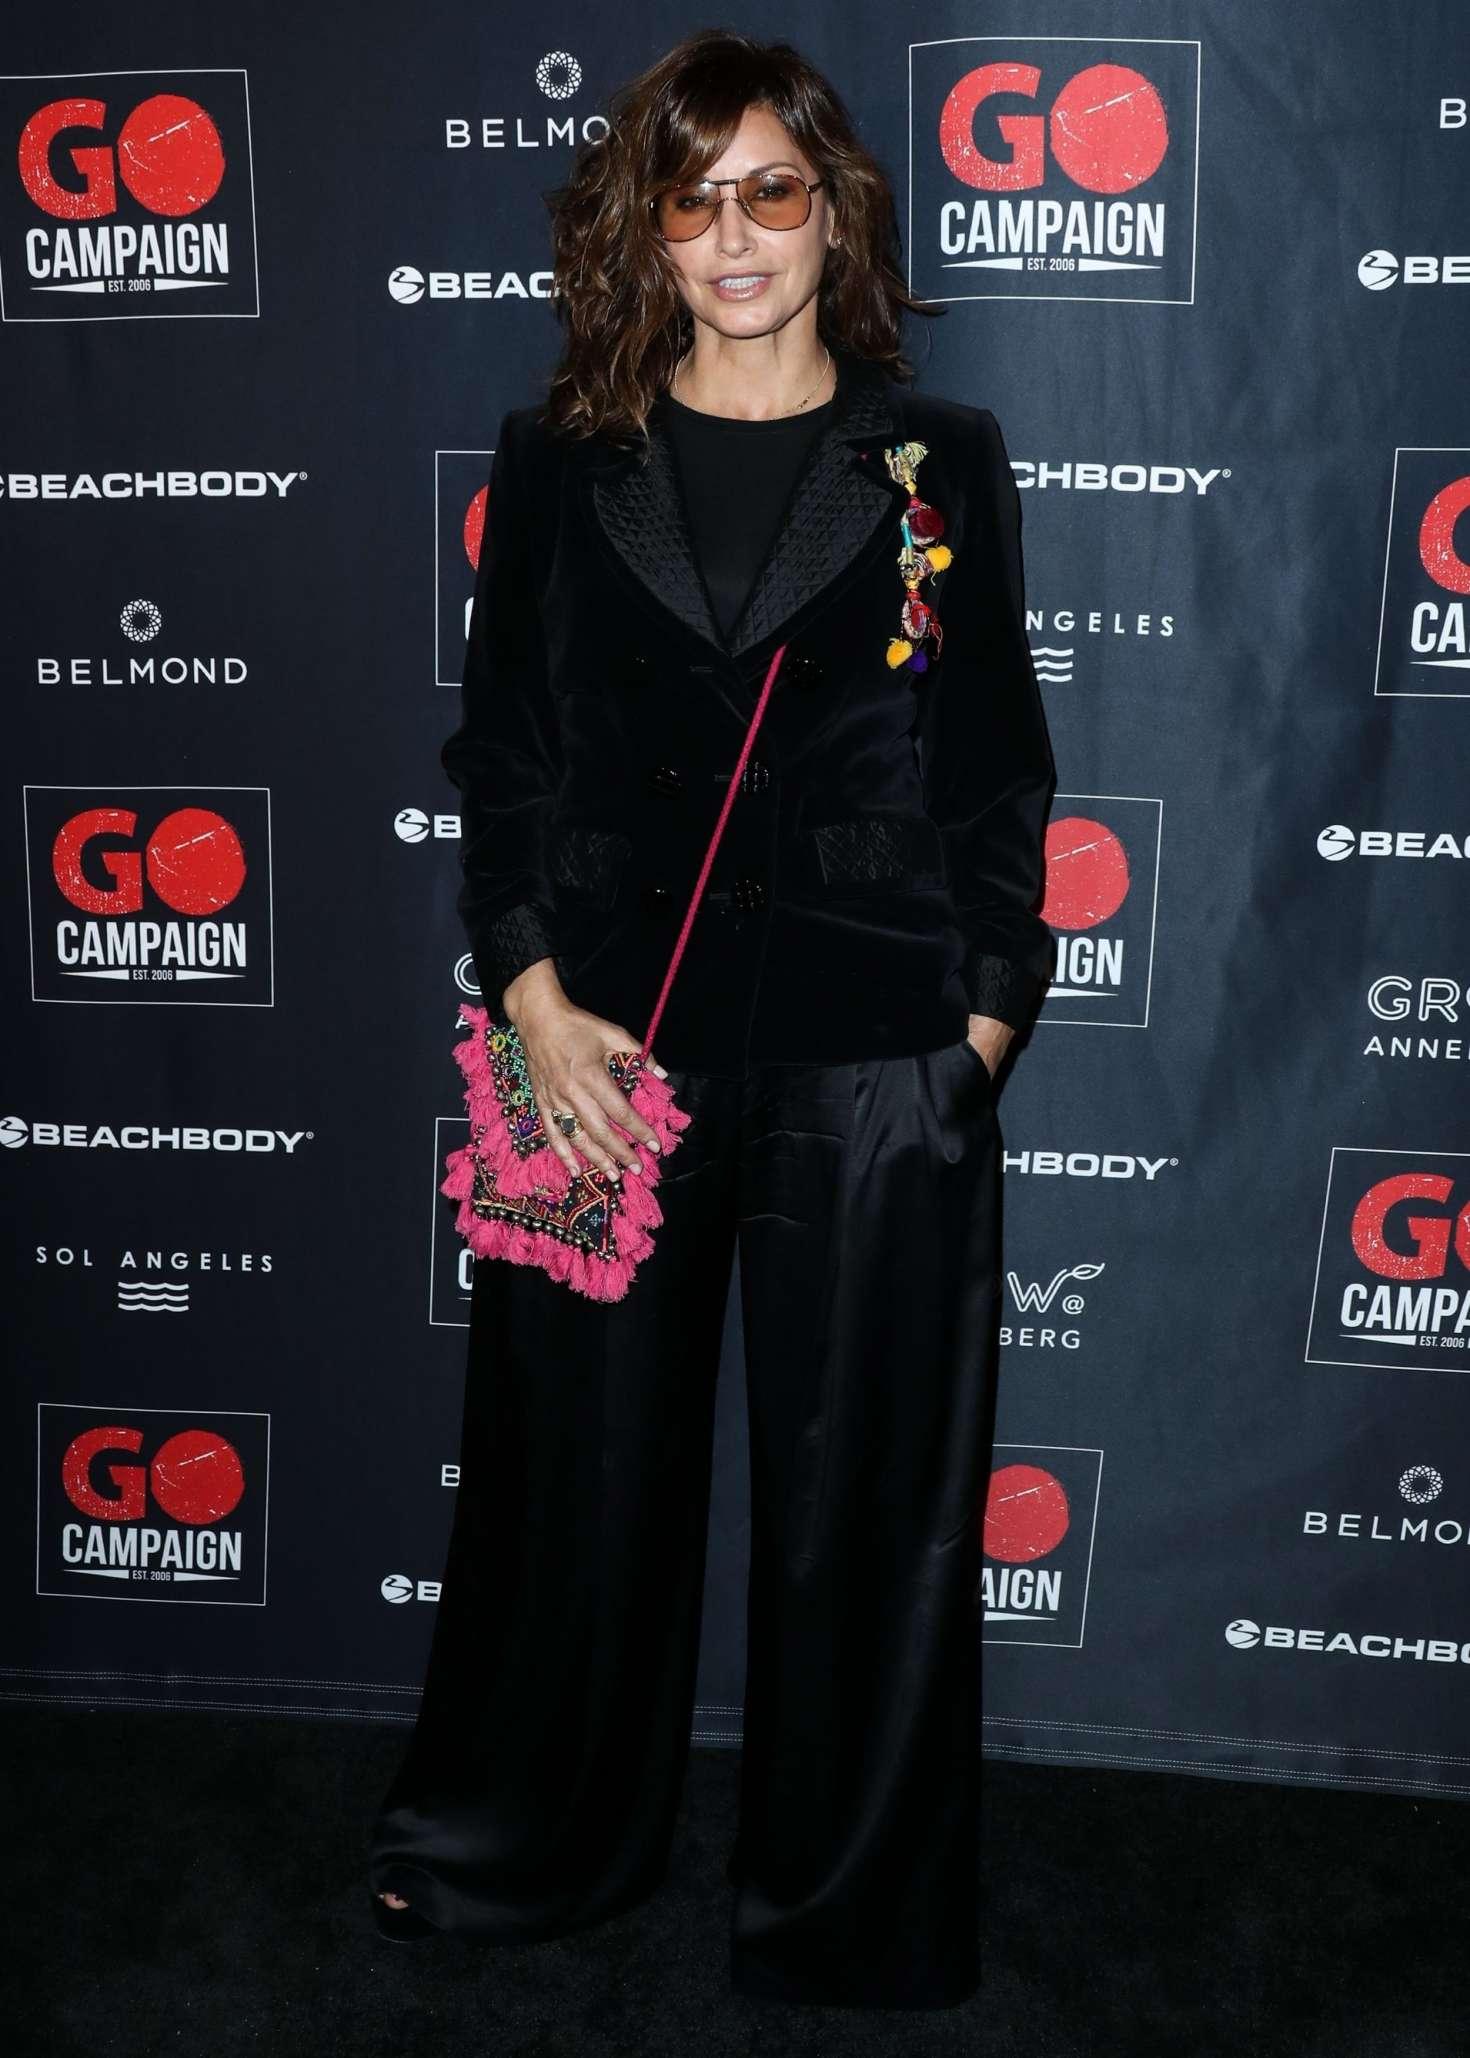 Gina Gershon 2018 : Gina Gershon: 2018 GO Campaign Gala -08